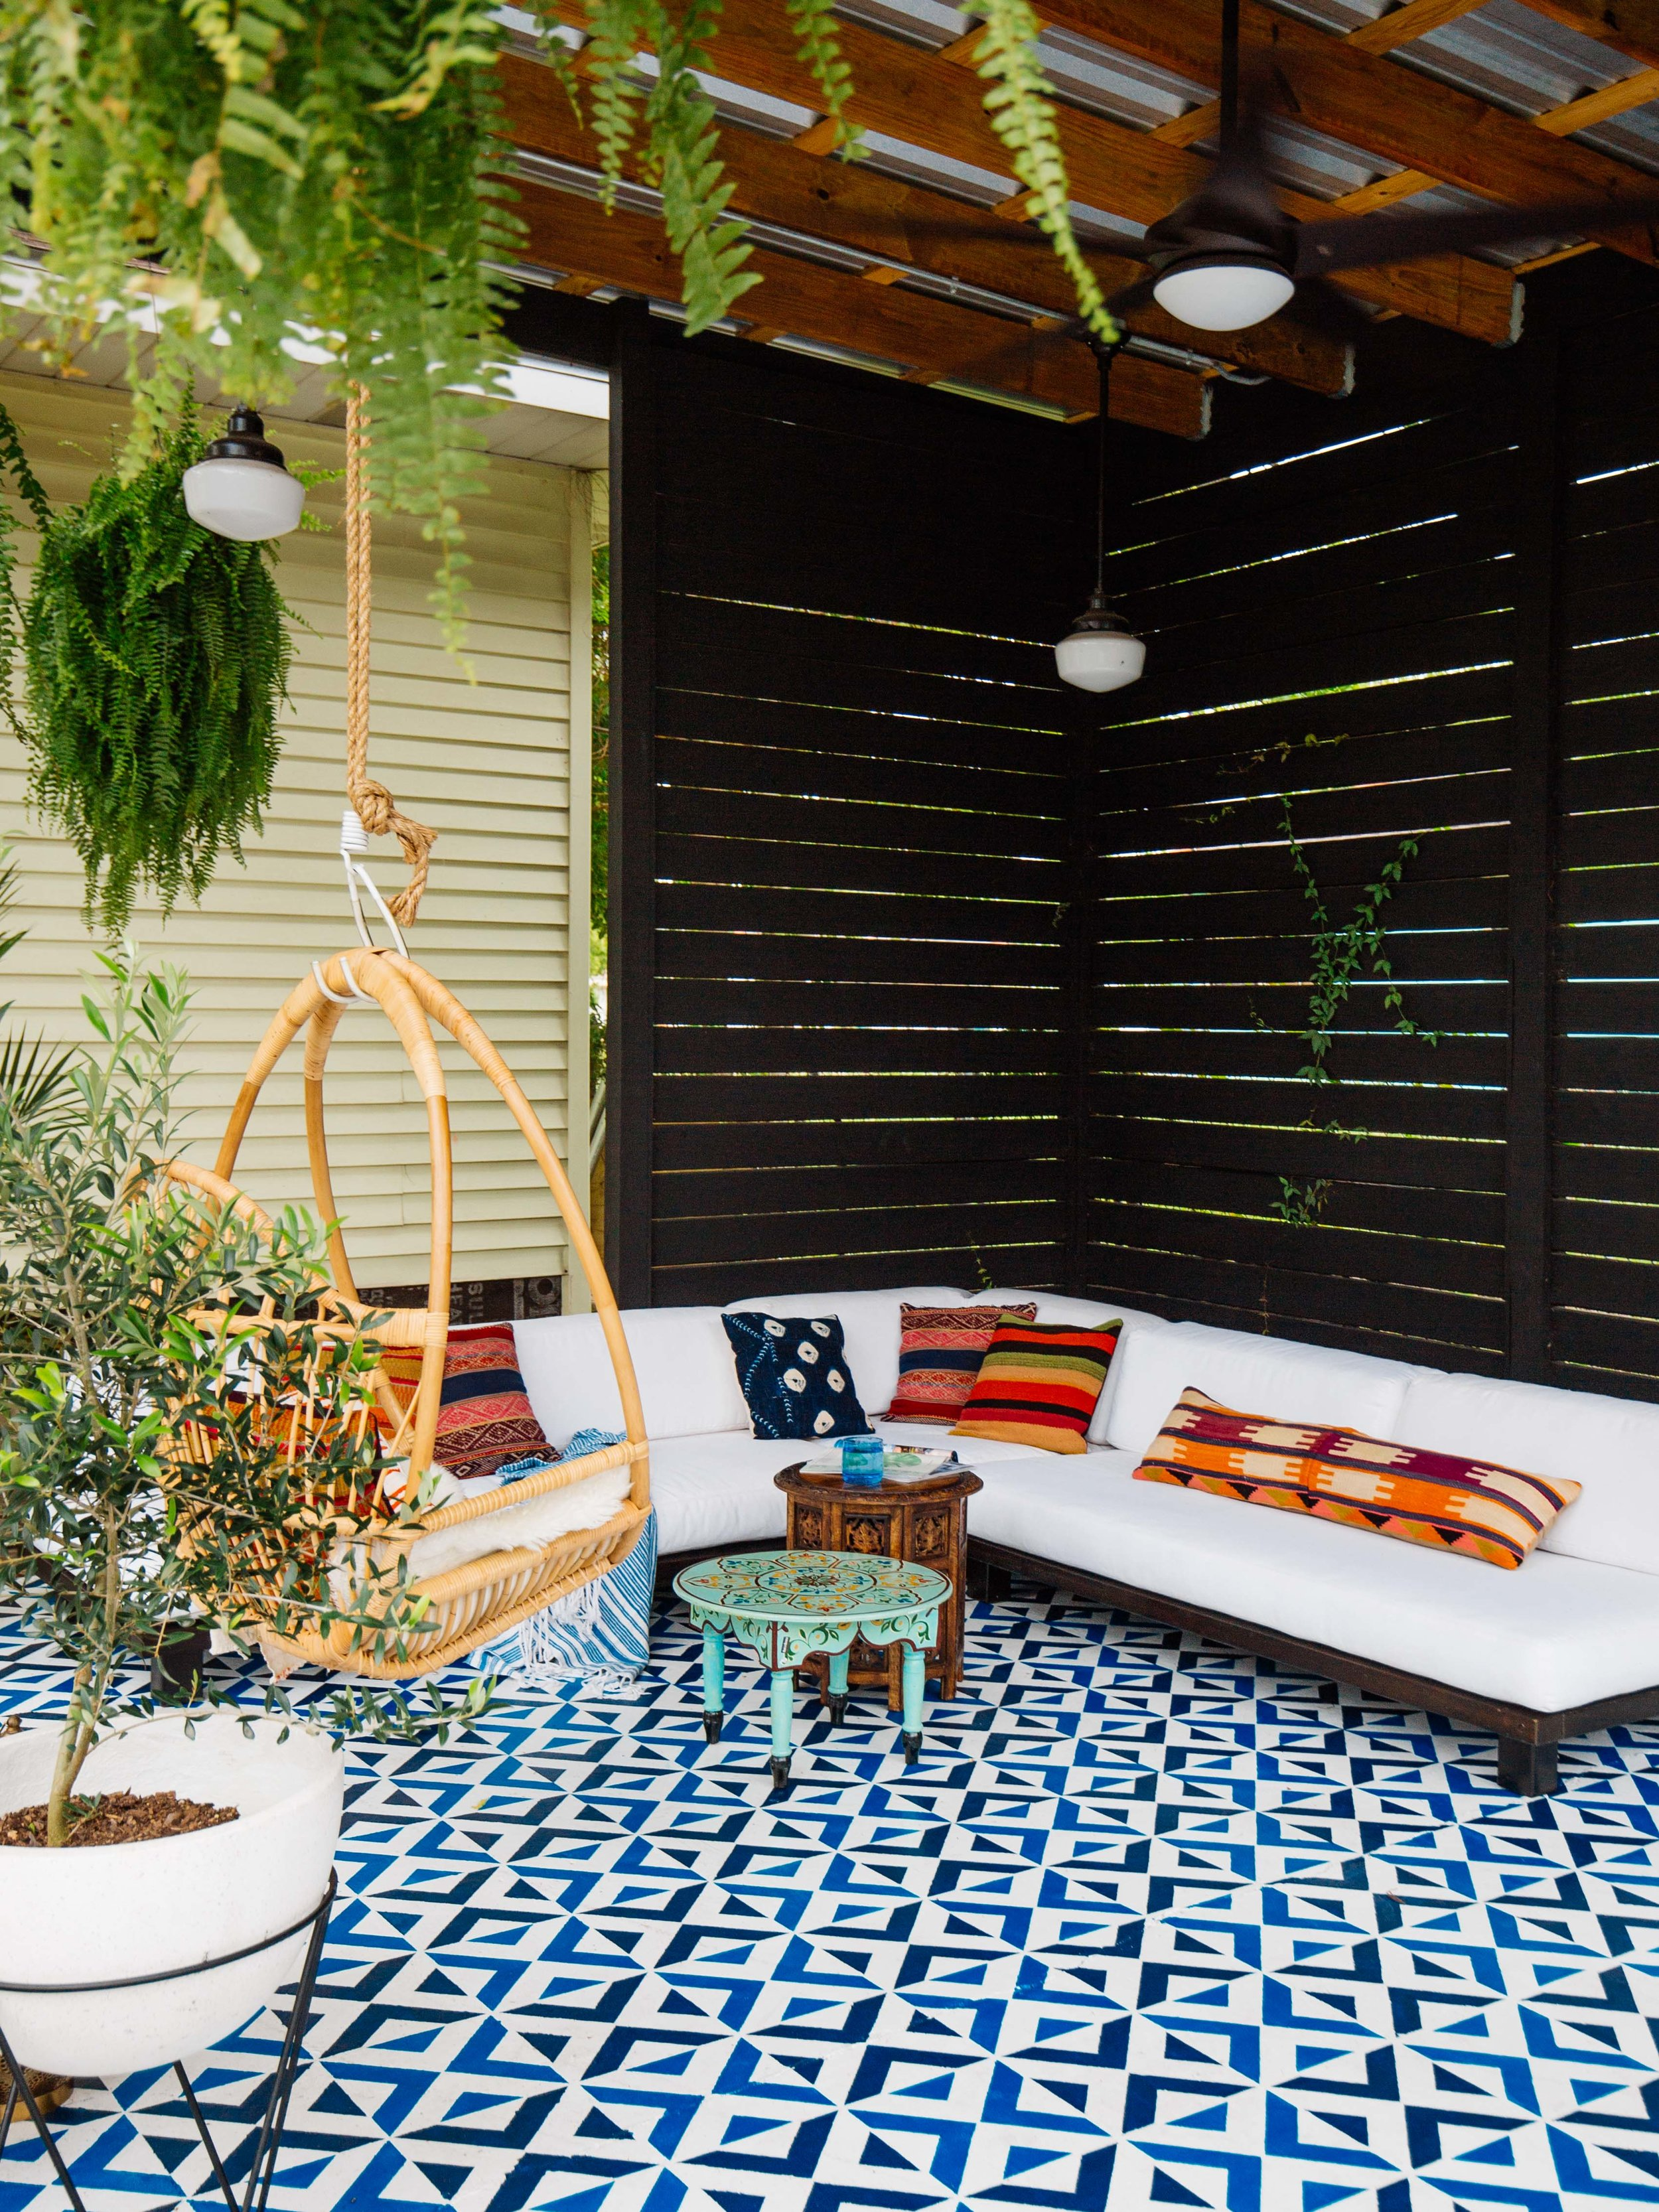 Patio DIY • Painted Floor Tiles — OLD BRAND NEW on Diy Concrete Patio Ideas id=60047